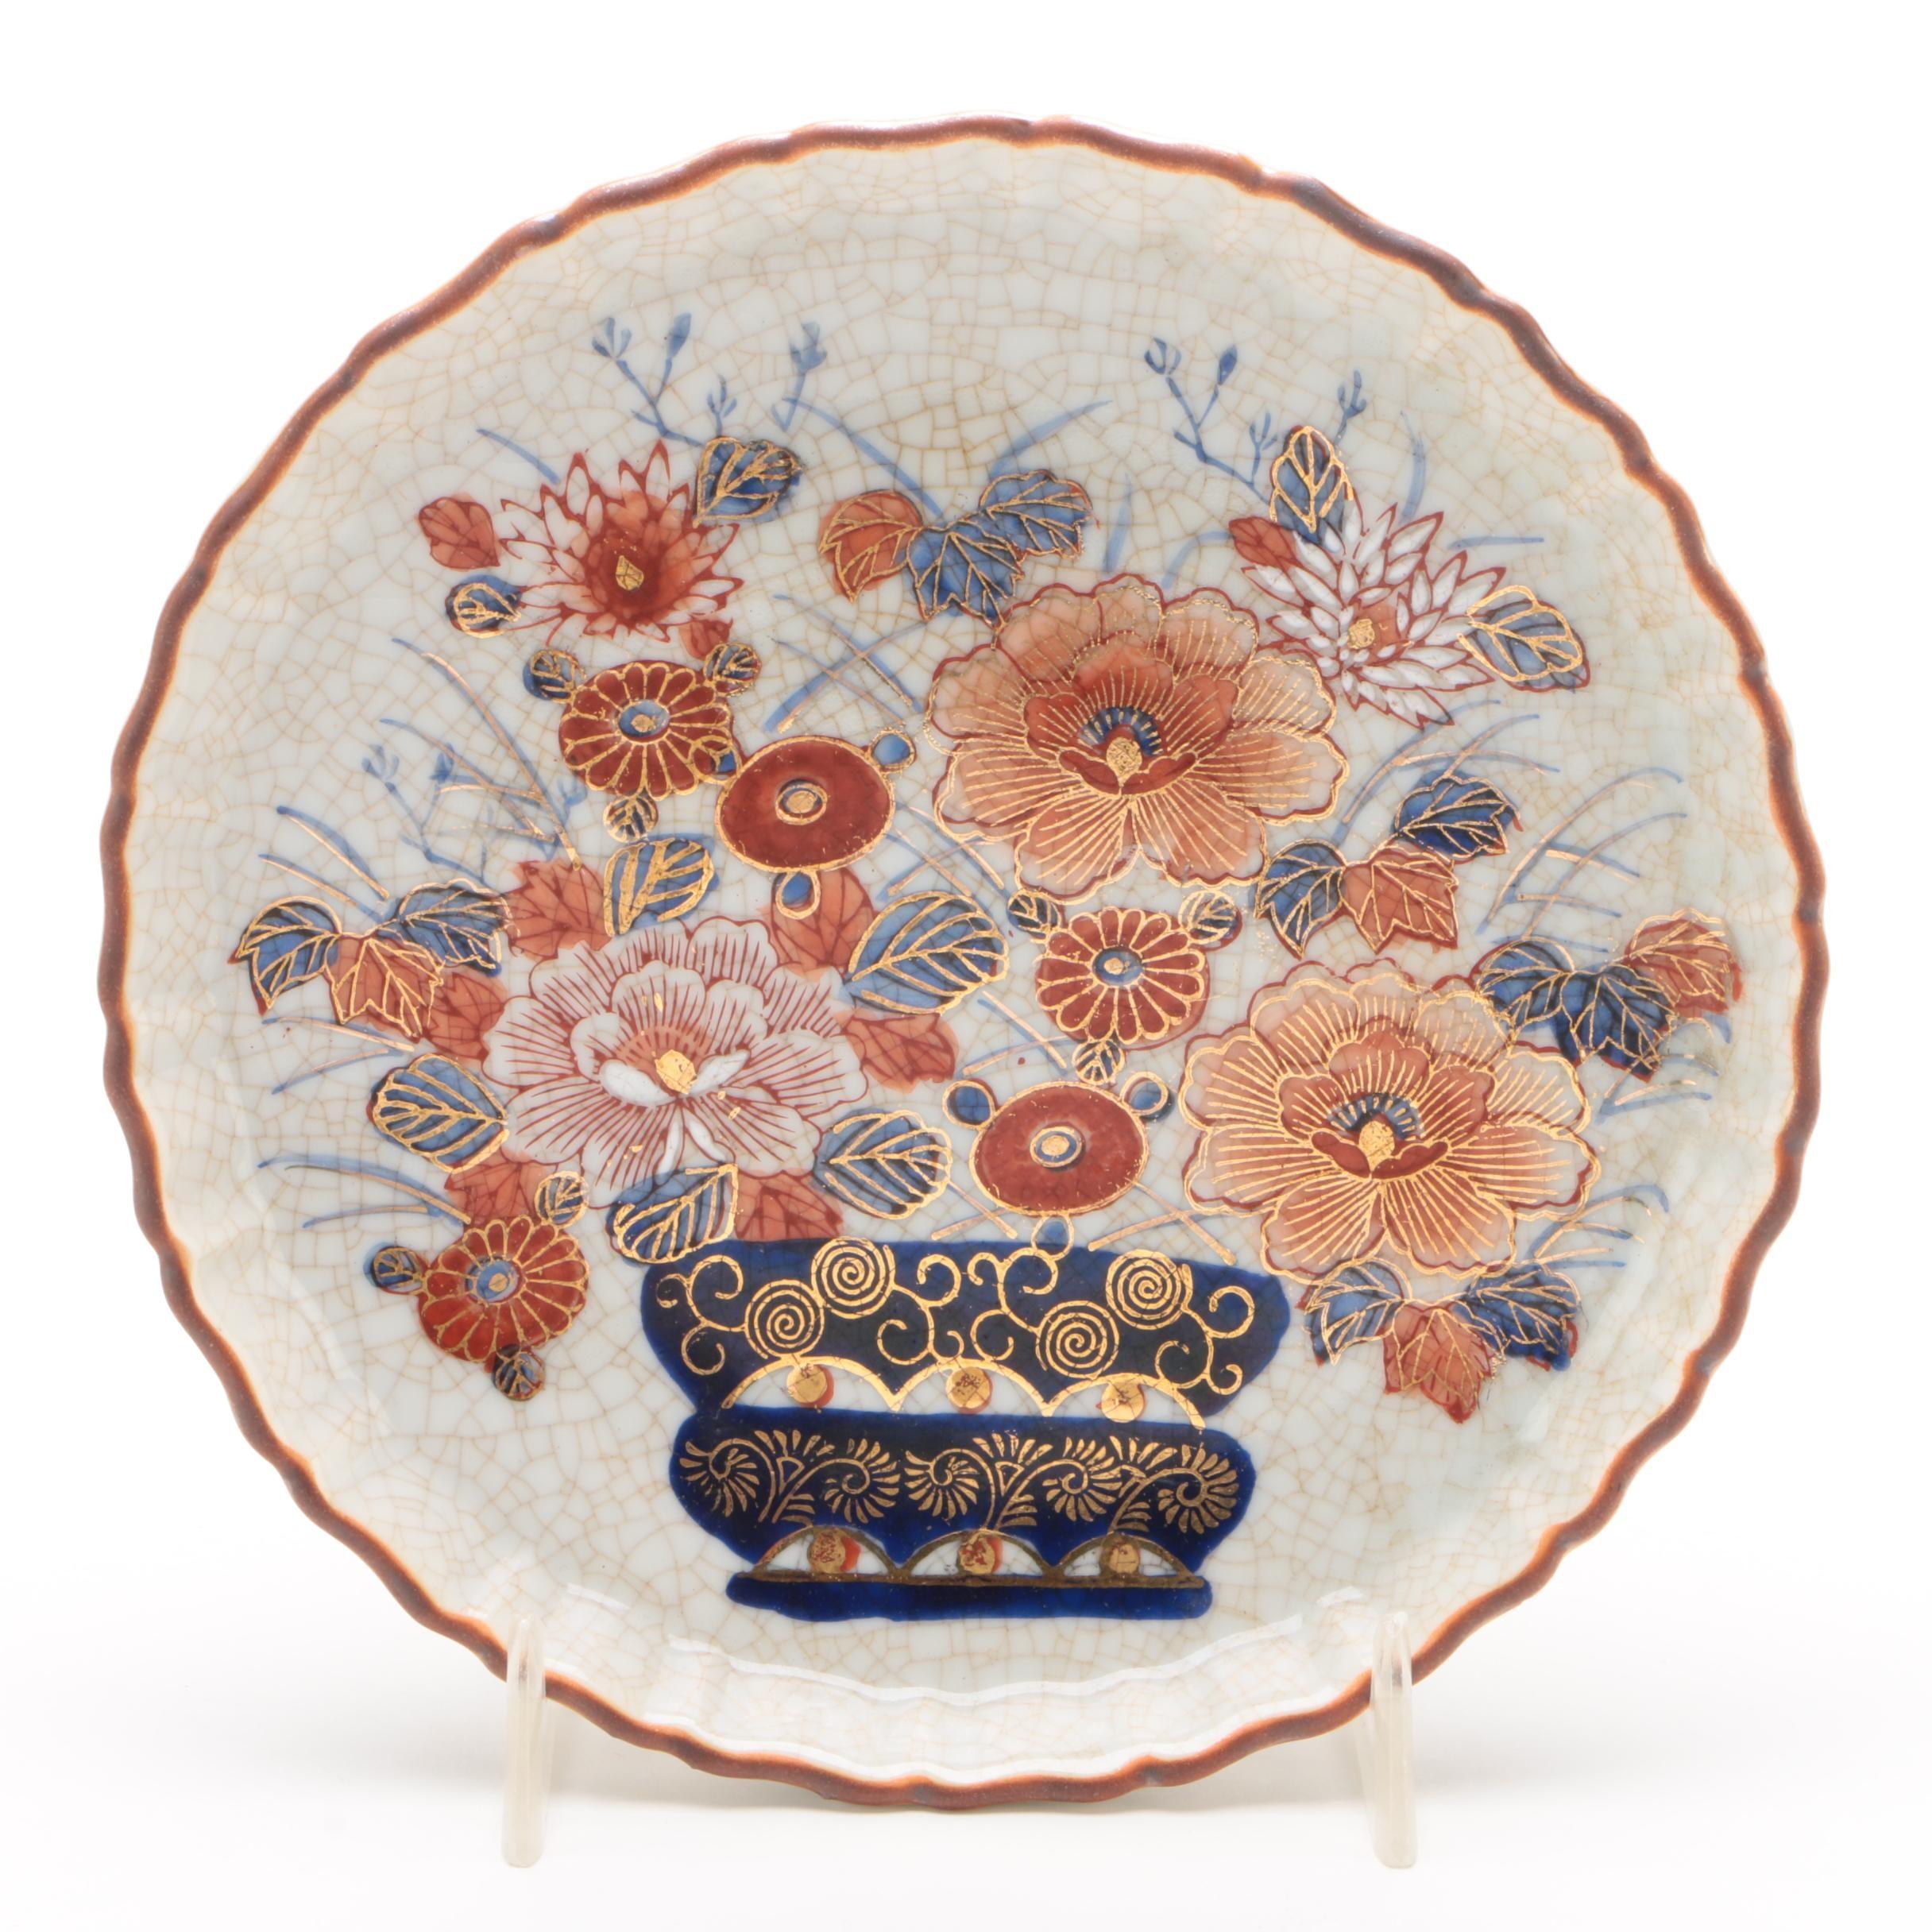 Imari Style Ceramic Plate, Early 20th Century